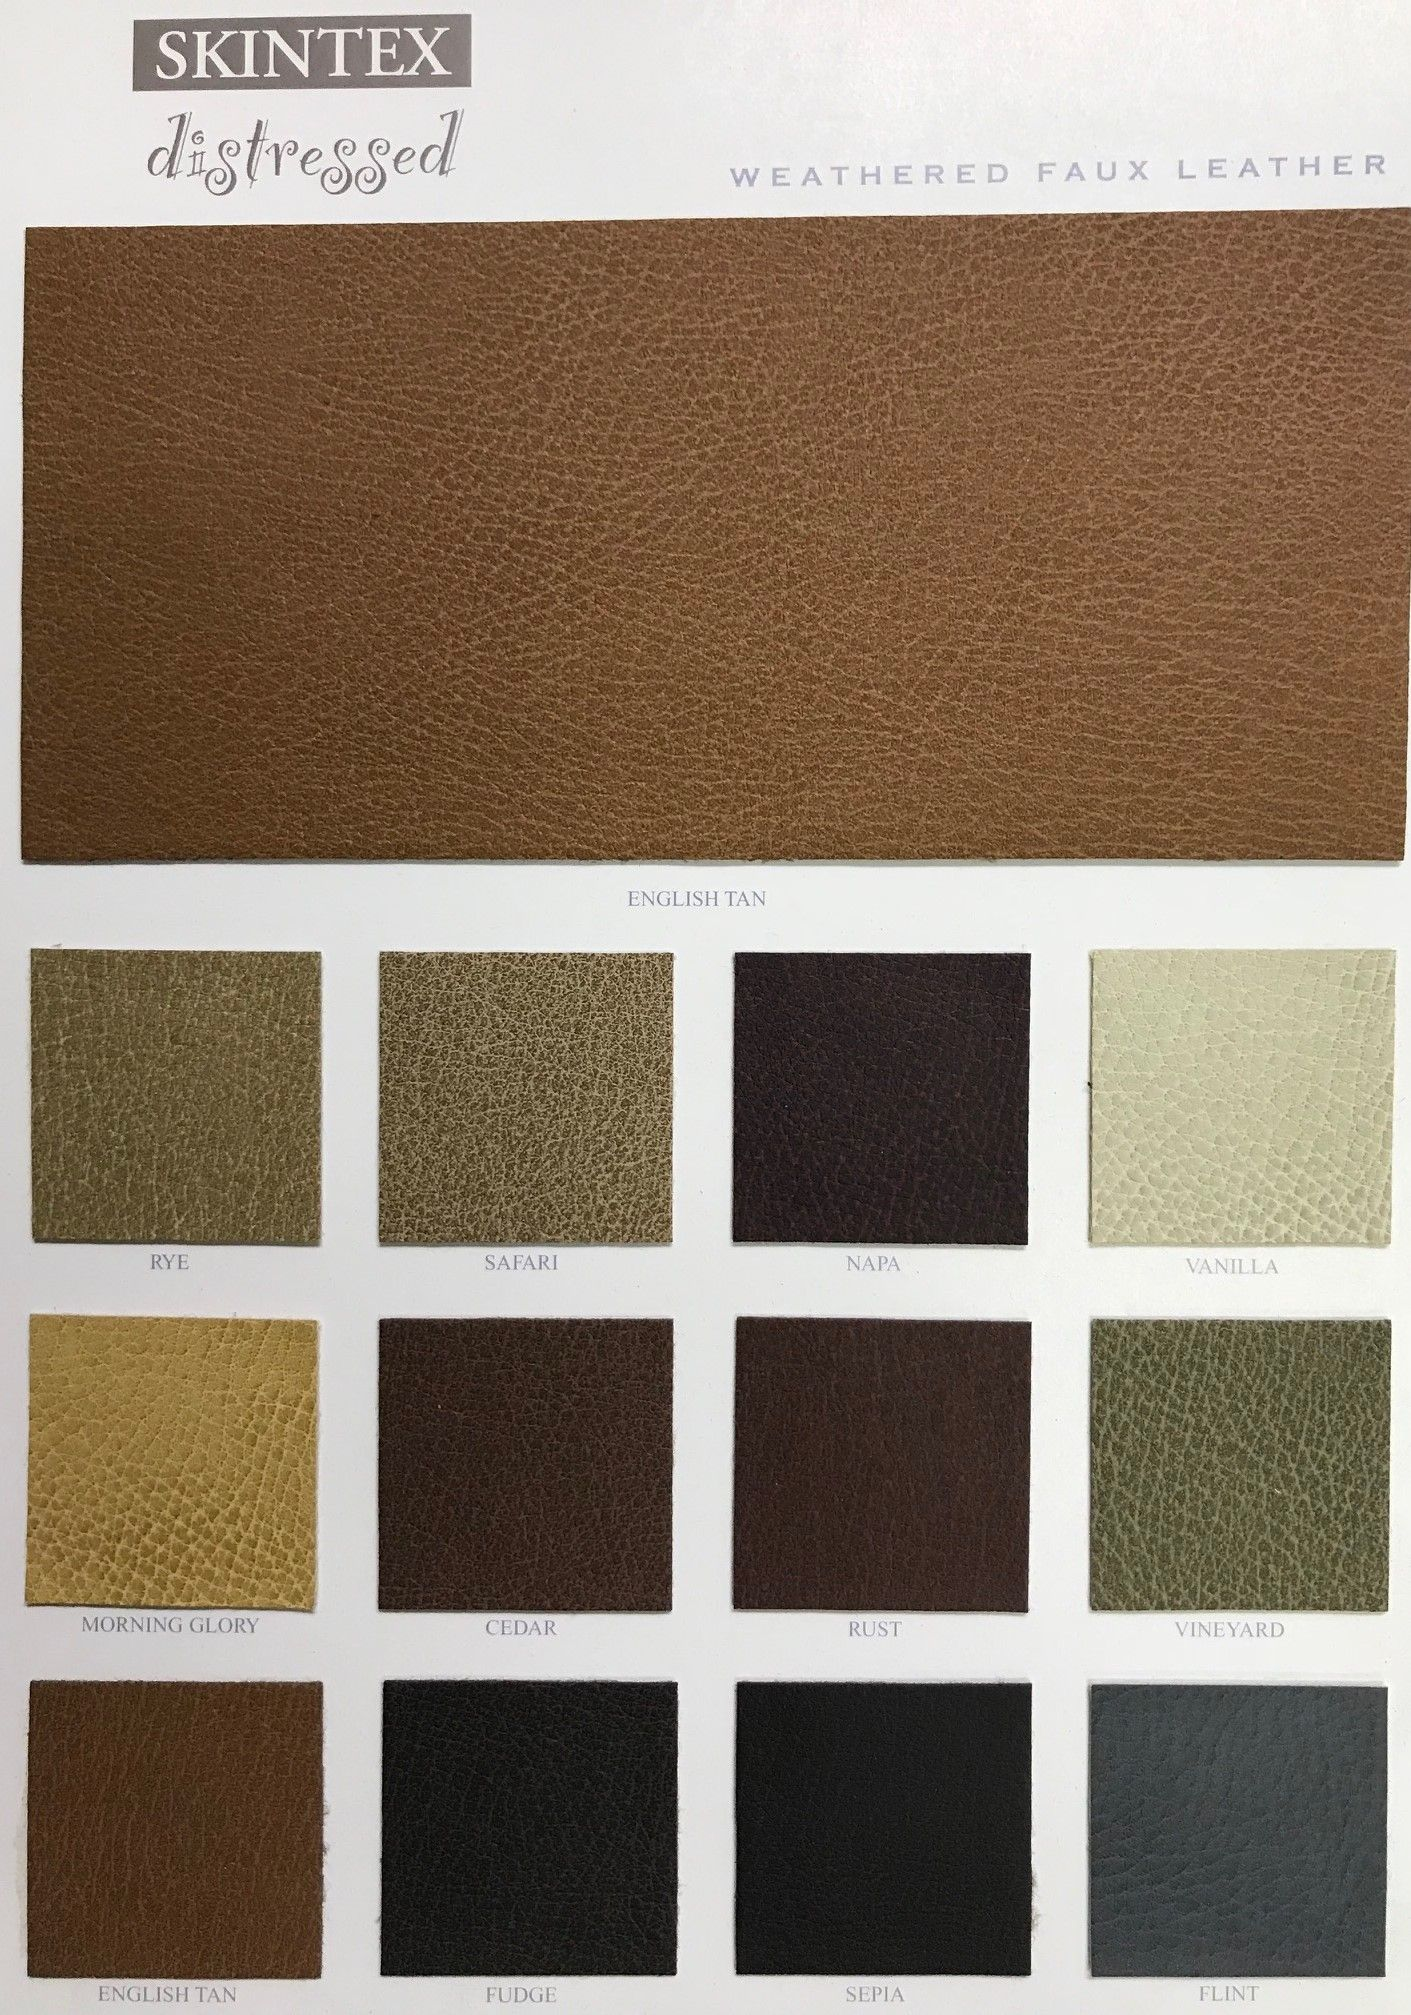 Distressed Skintex Faux Leather Upholstery Vinyl Vinyl Fabric